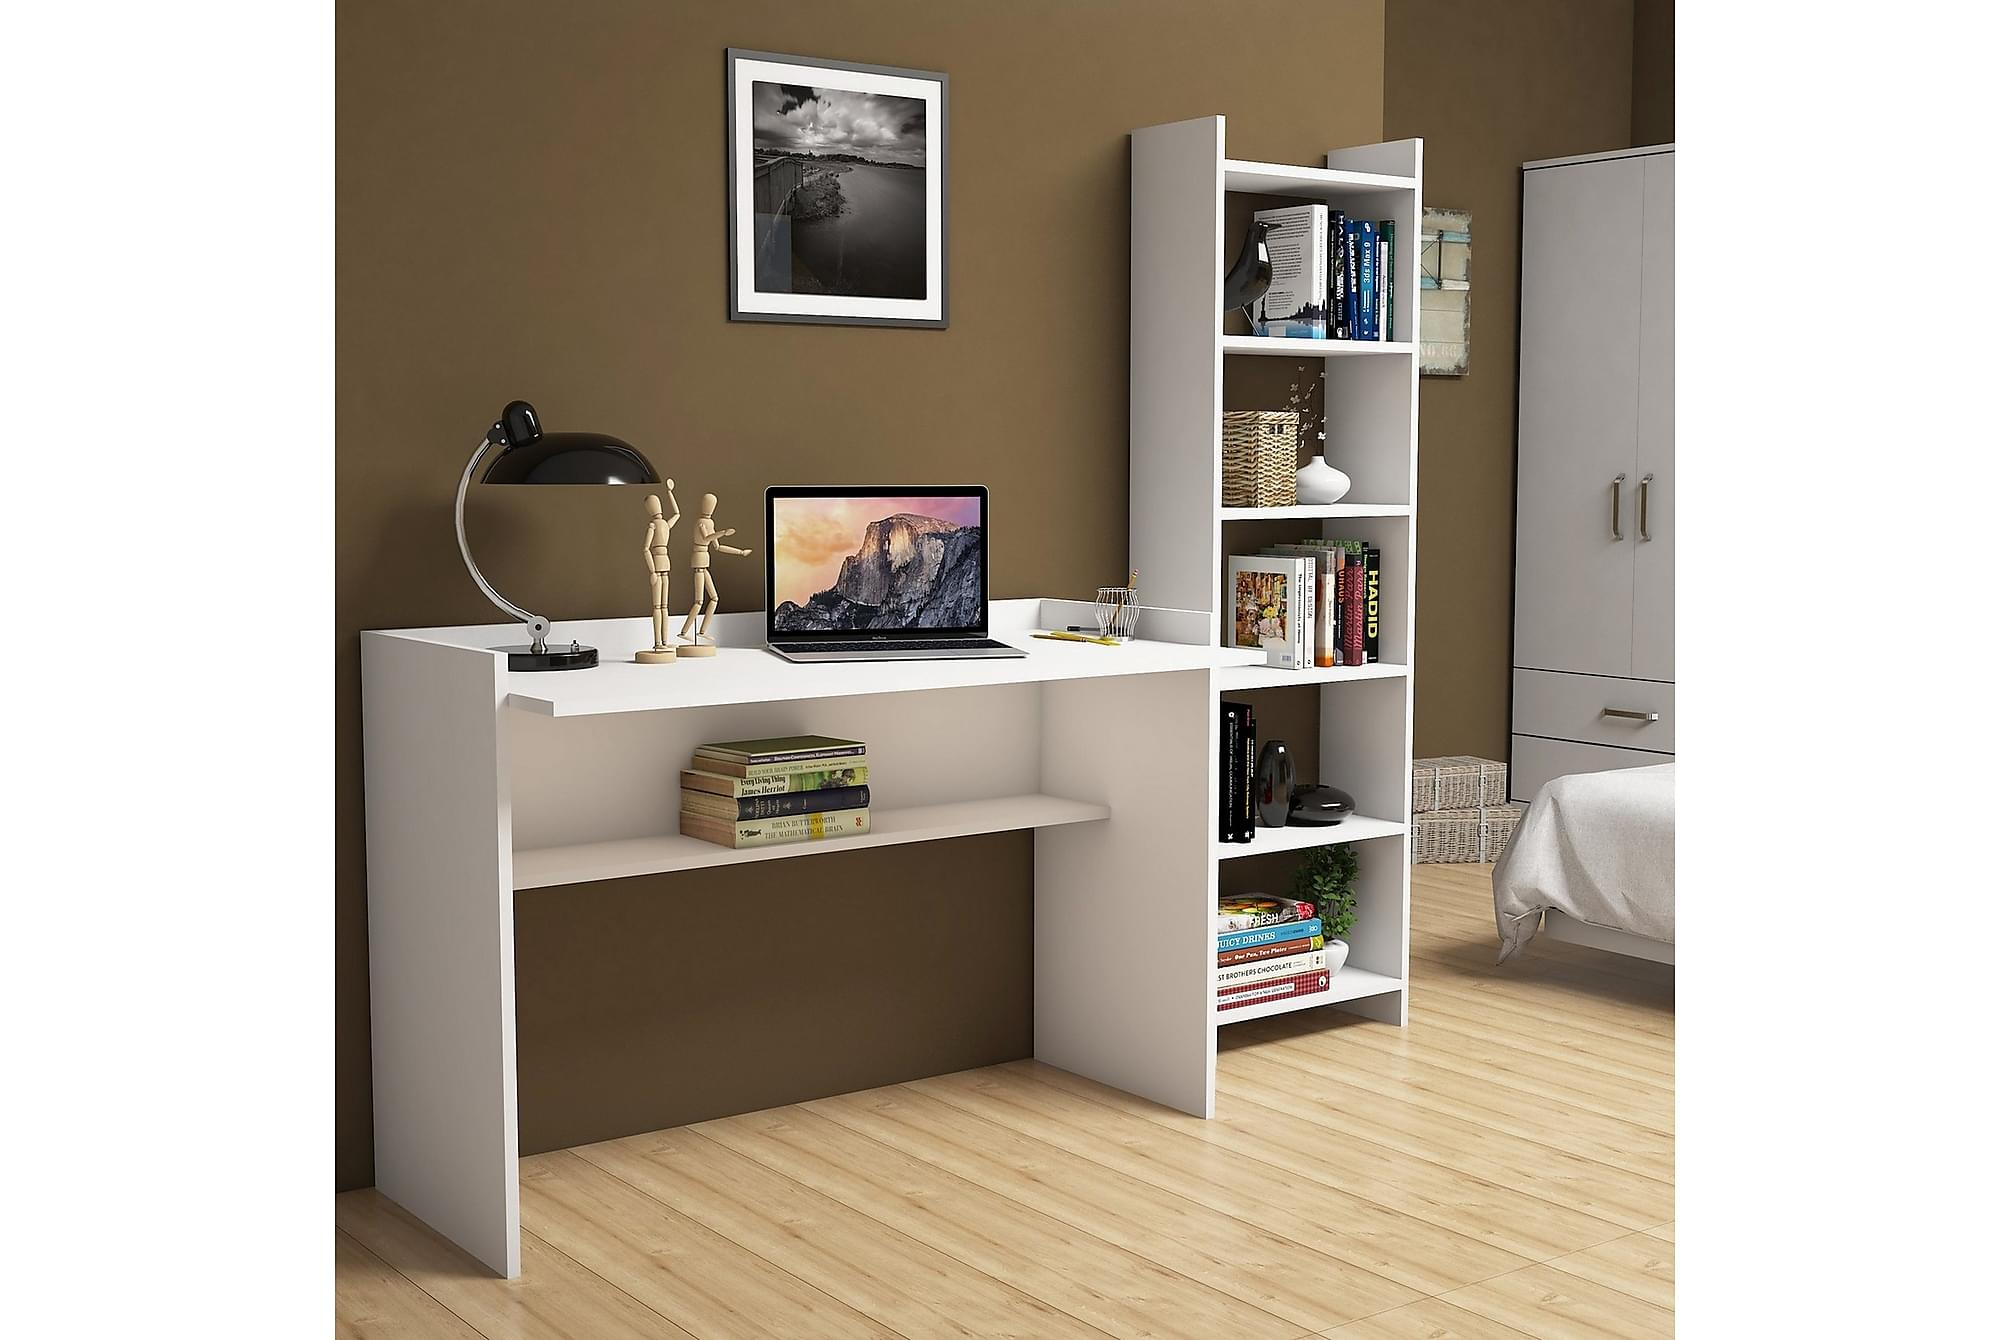 DARNEZ Skrivbord och Bokhylla 118 cm Vit, Datorbord